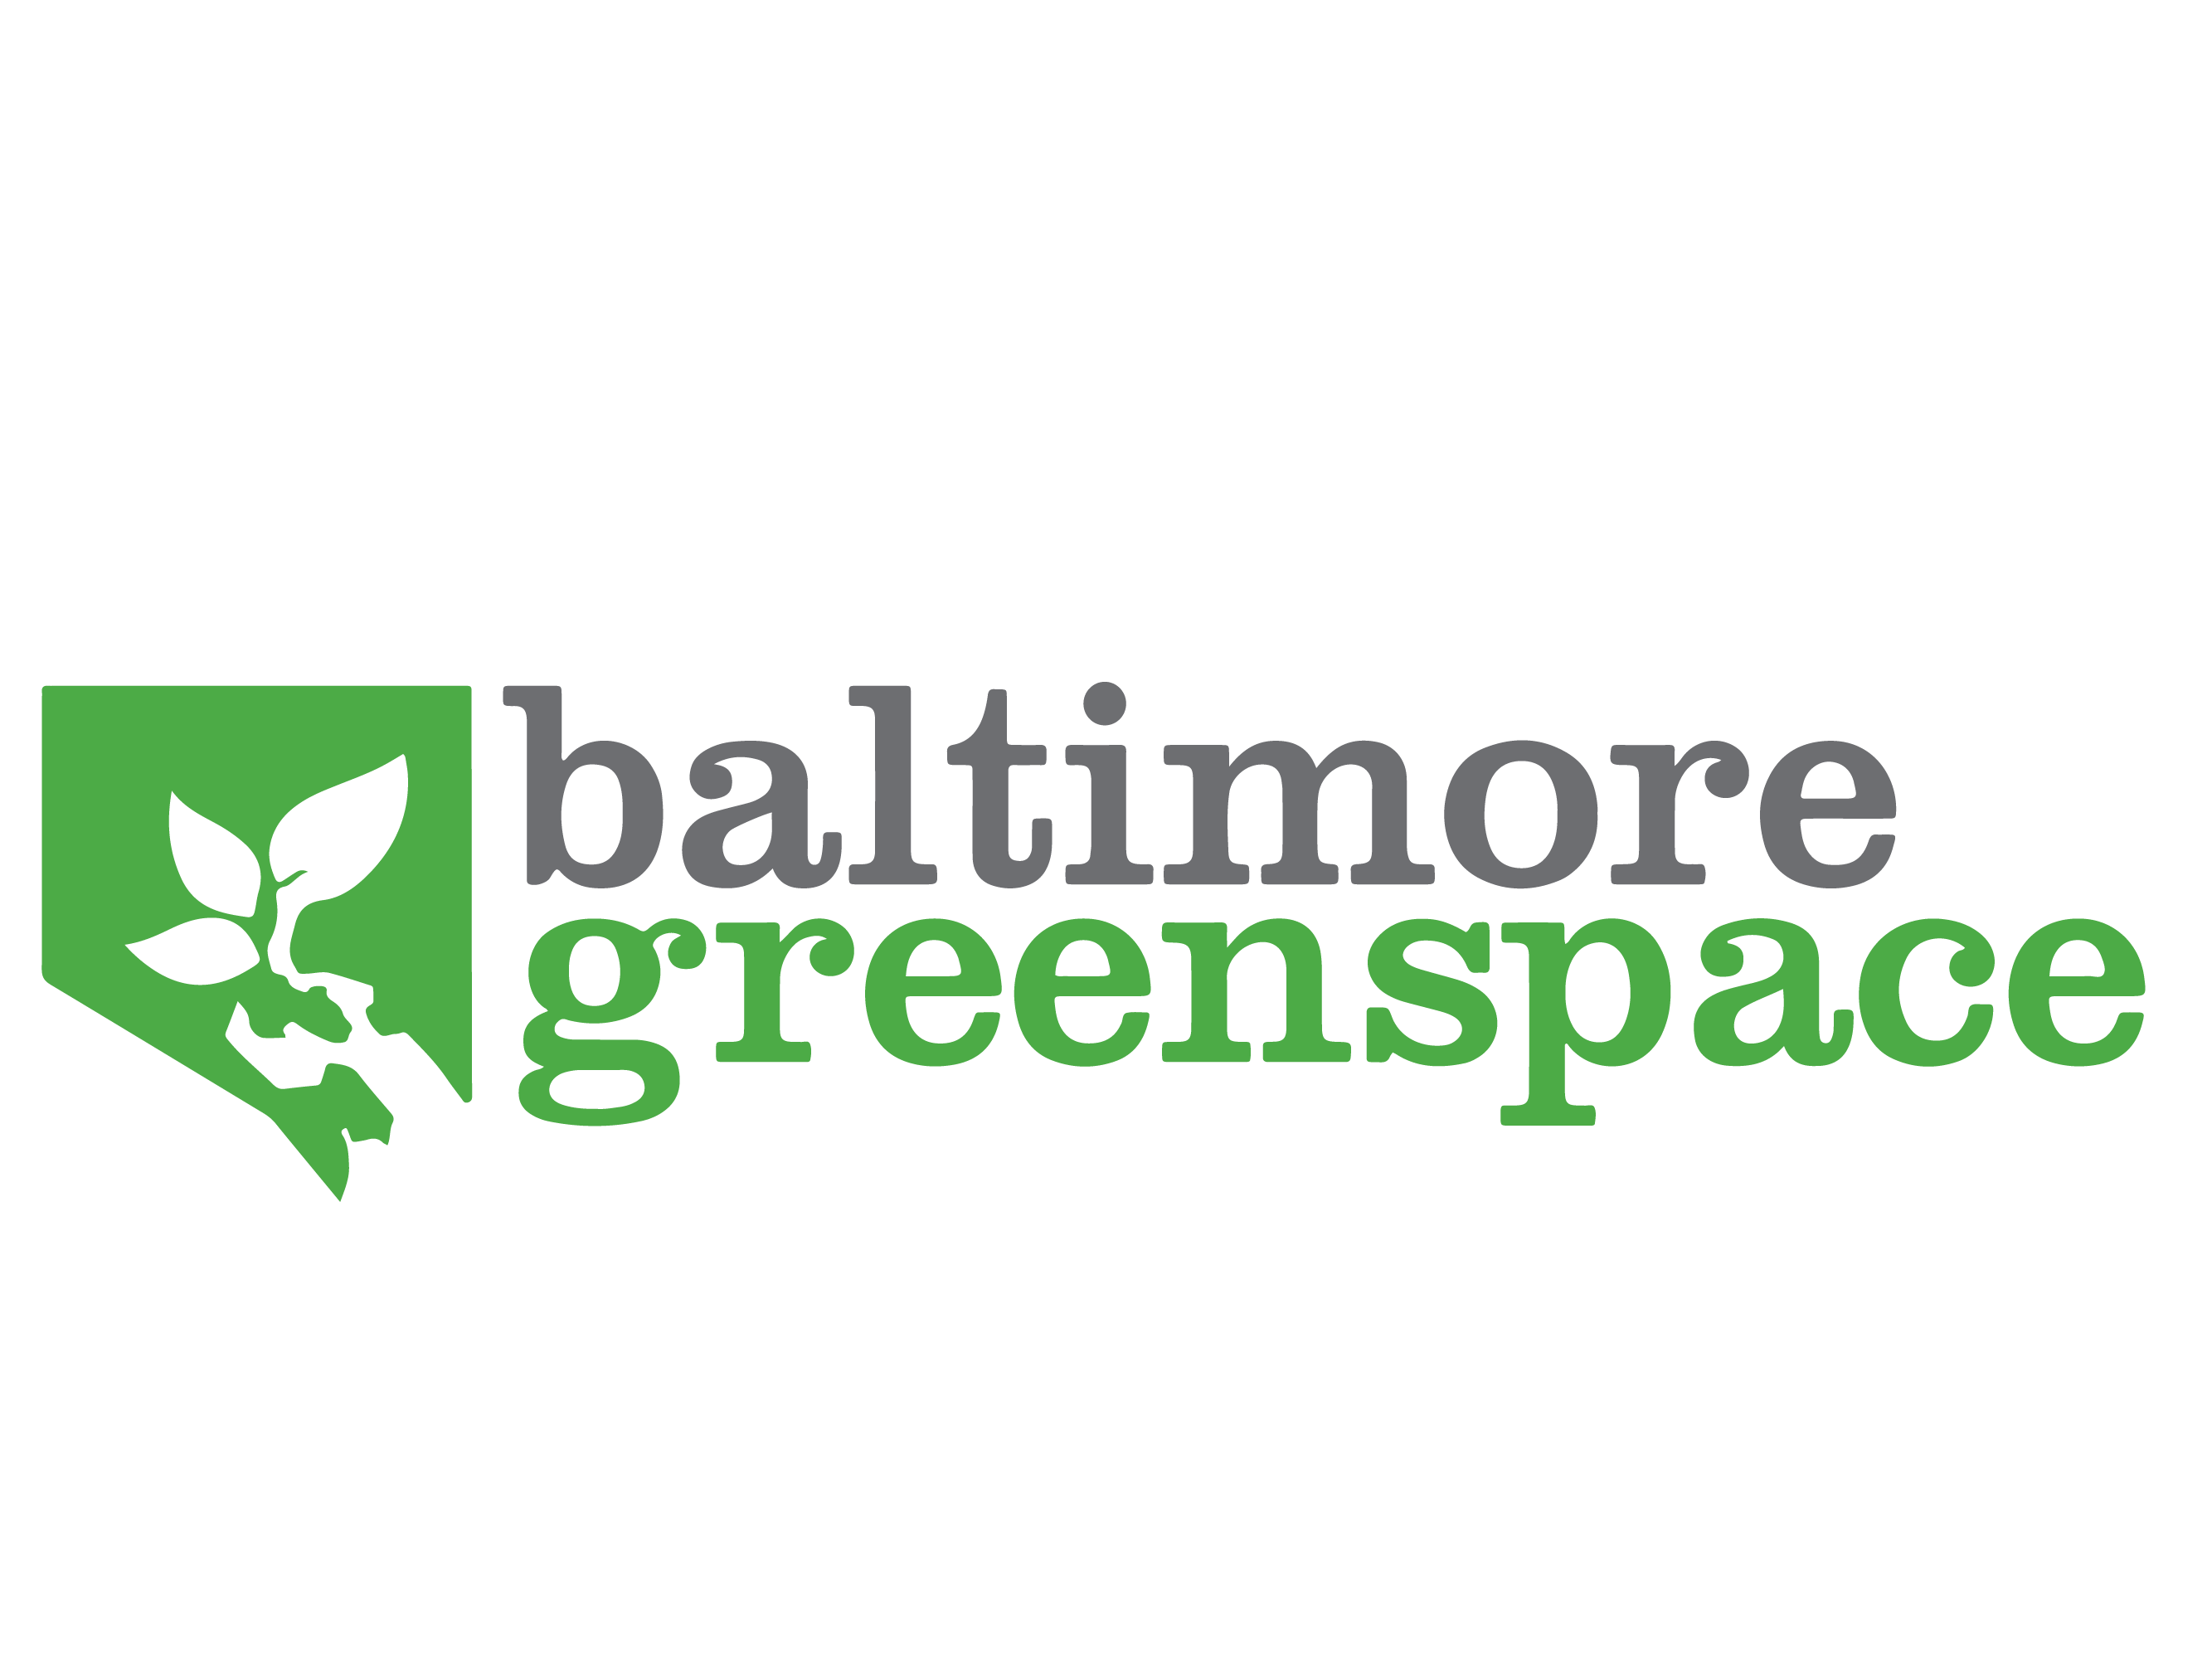 baltimore-greenspace